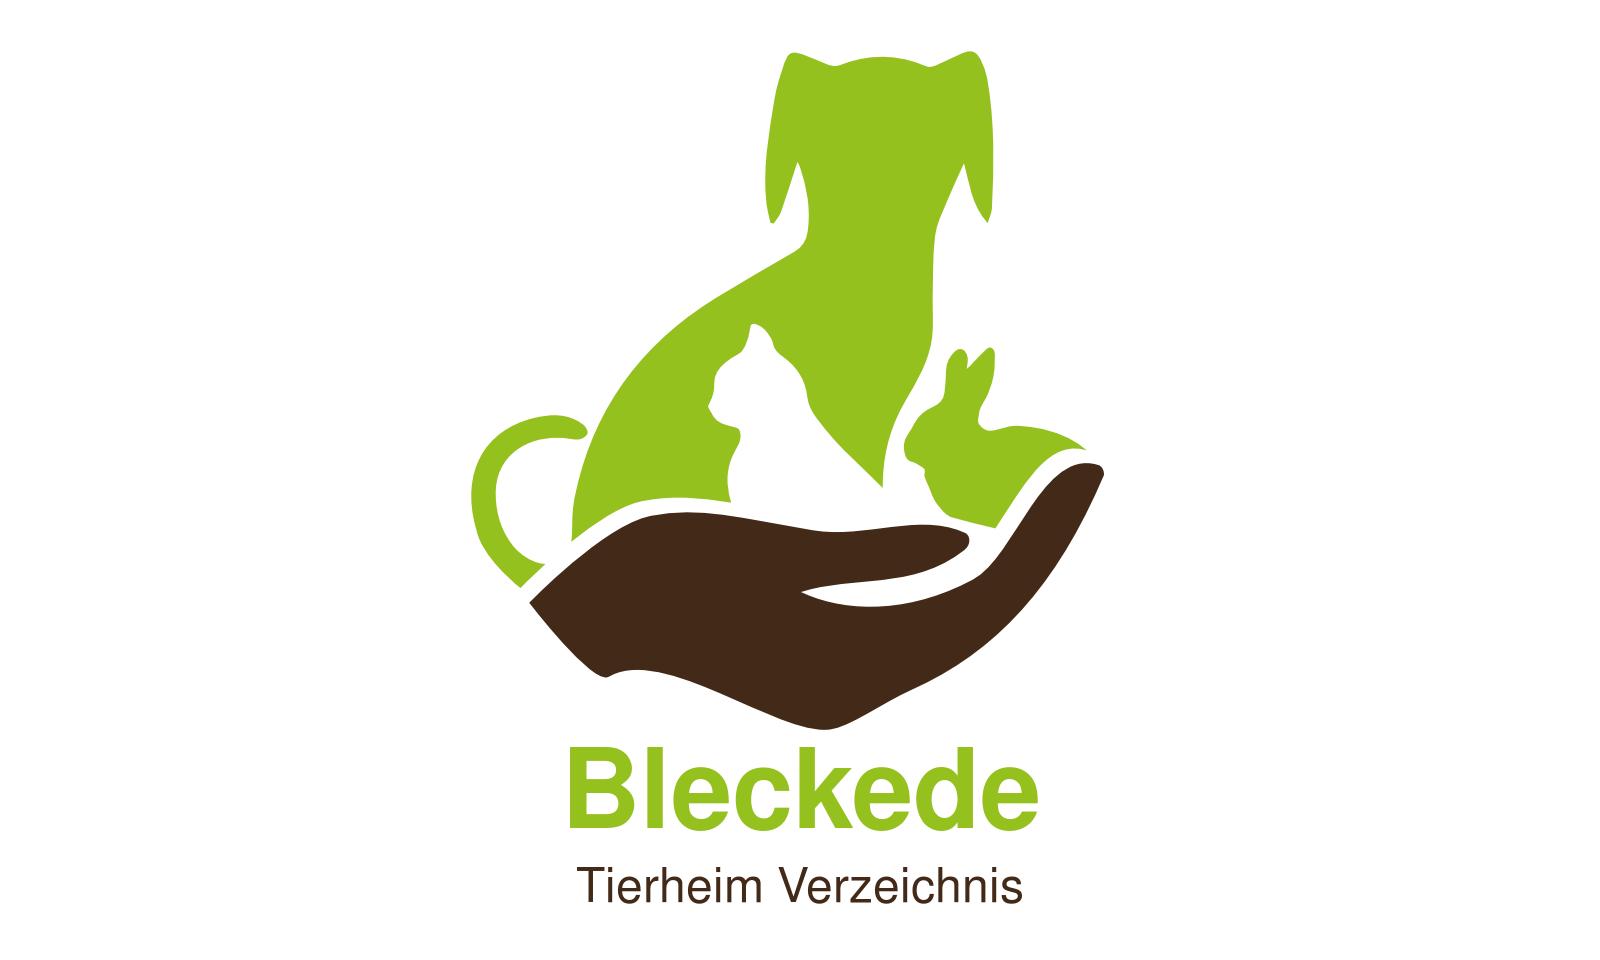 Tierheim Bleckede